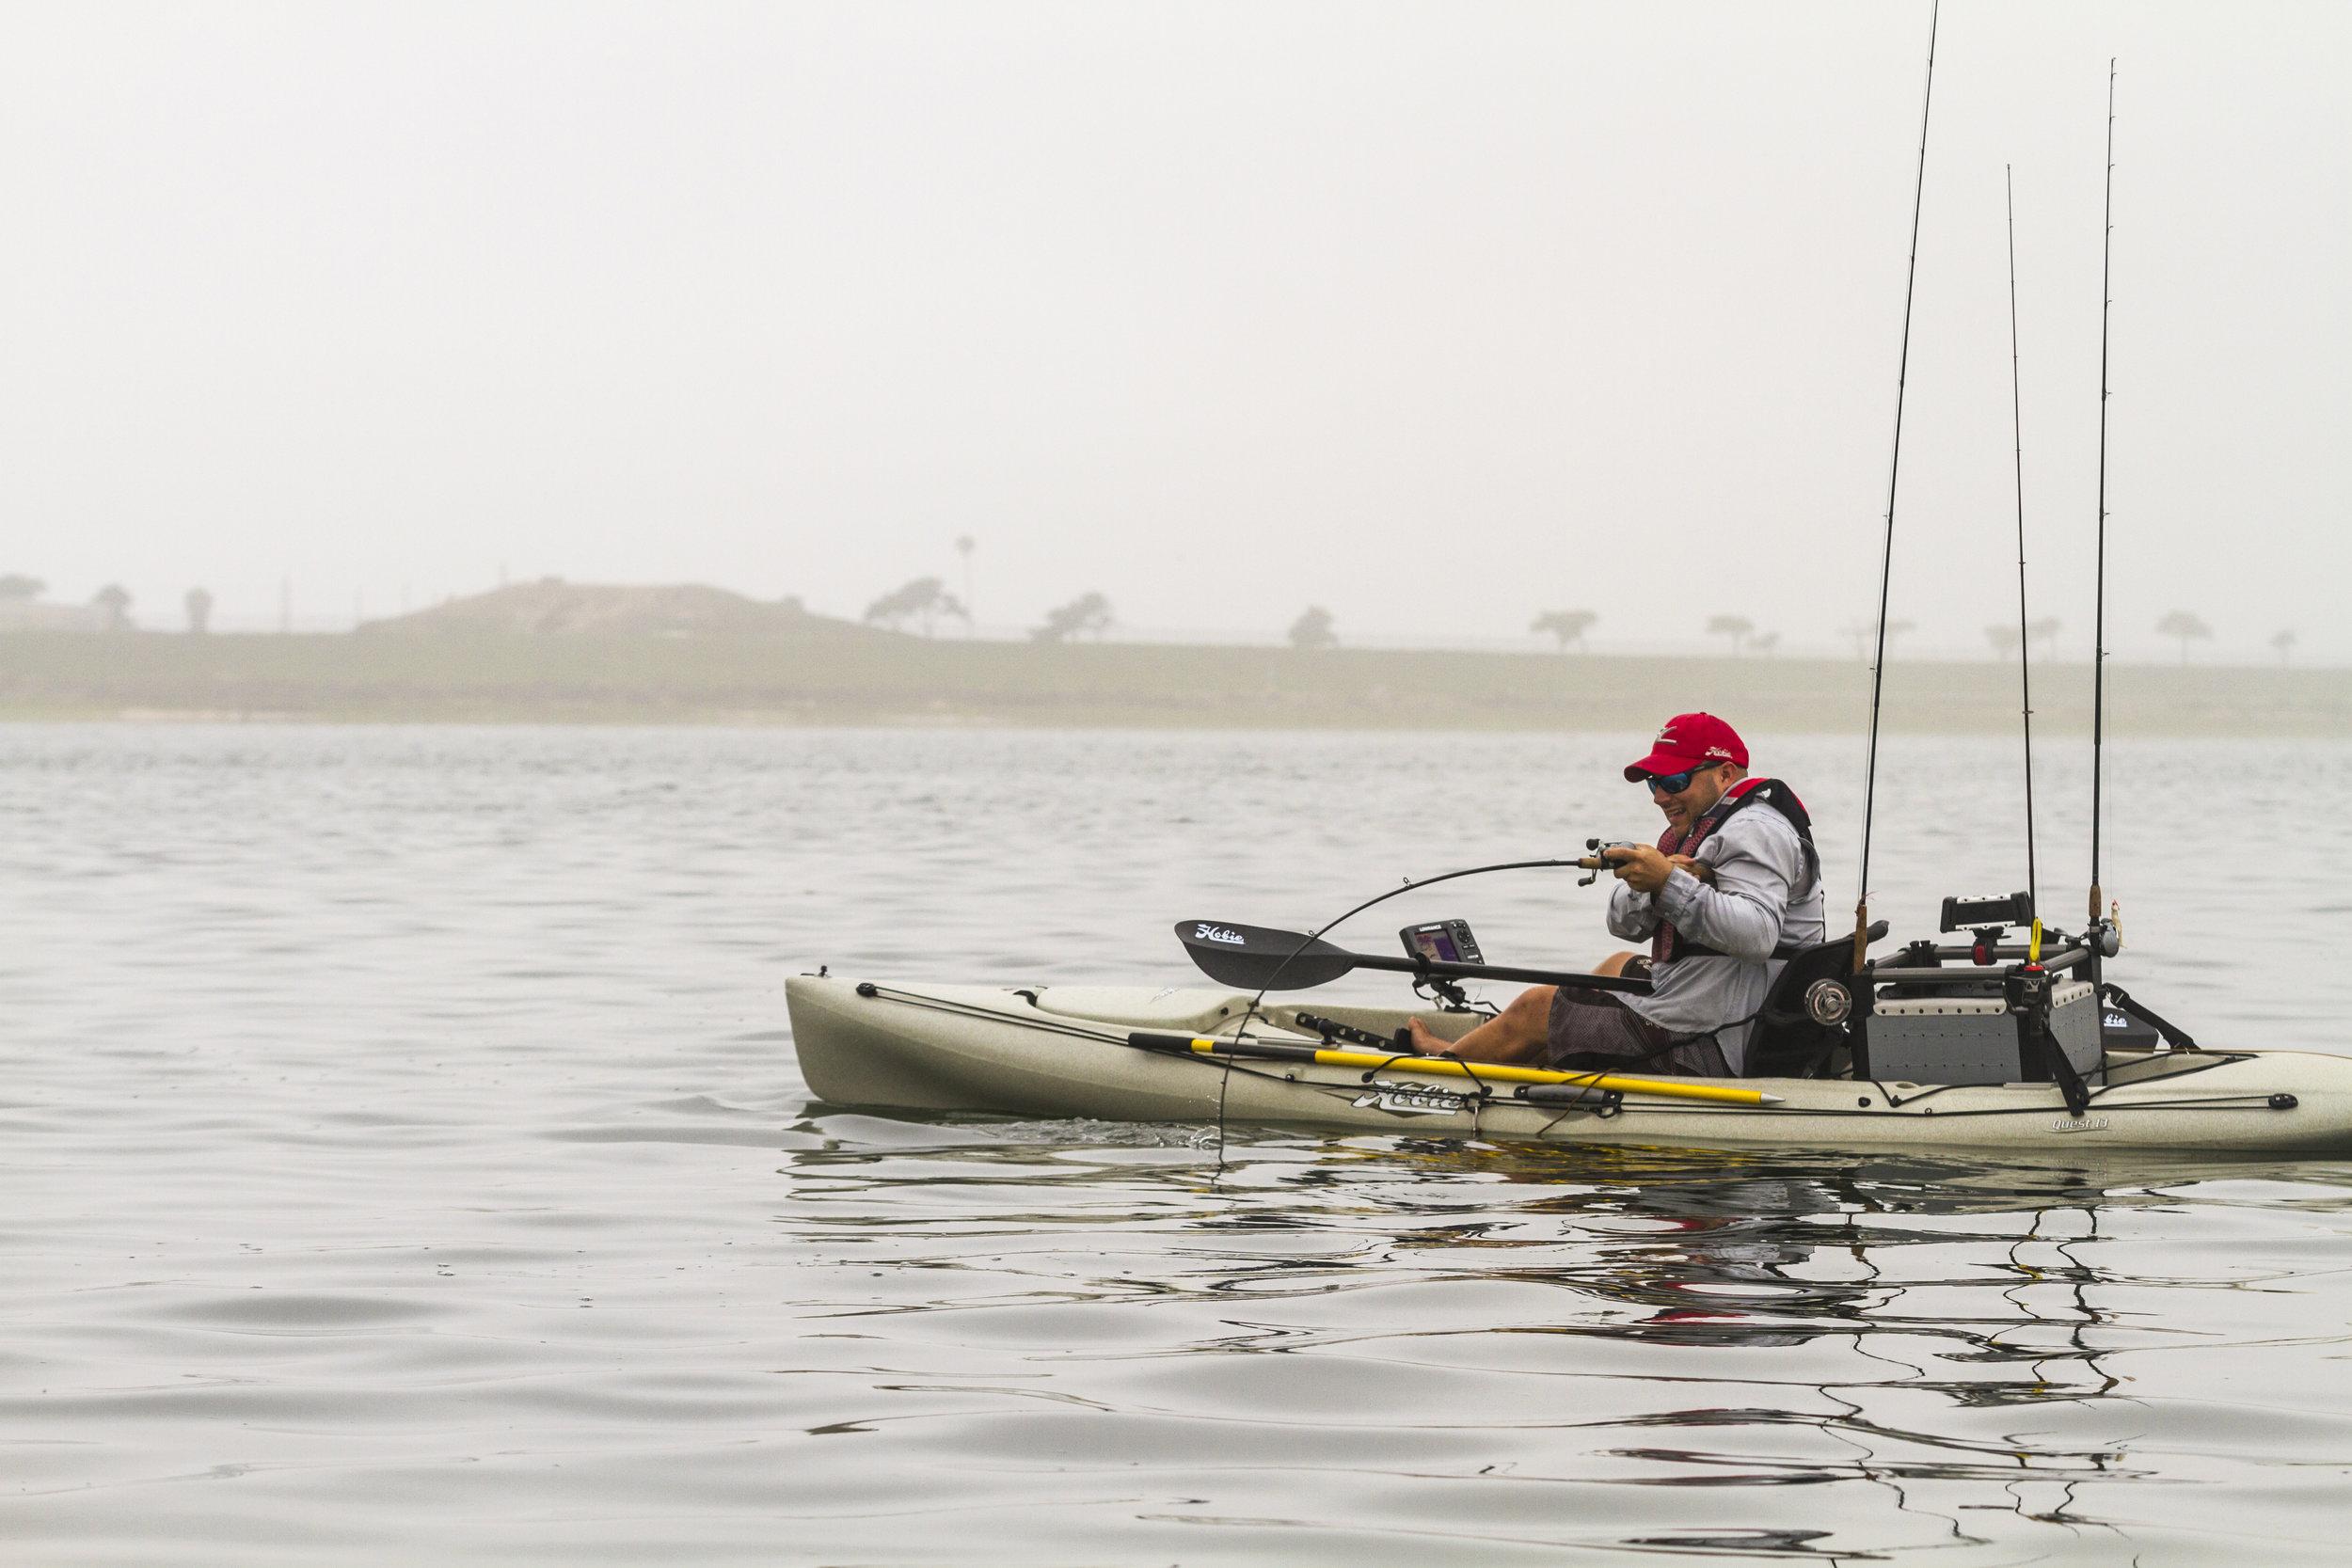 Quest13_fishing_foggy_Shane_Dune_flighting_9100_full.jpg